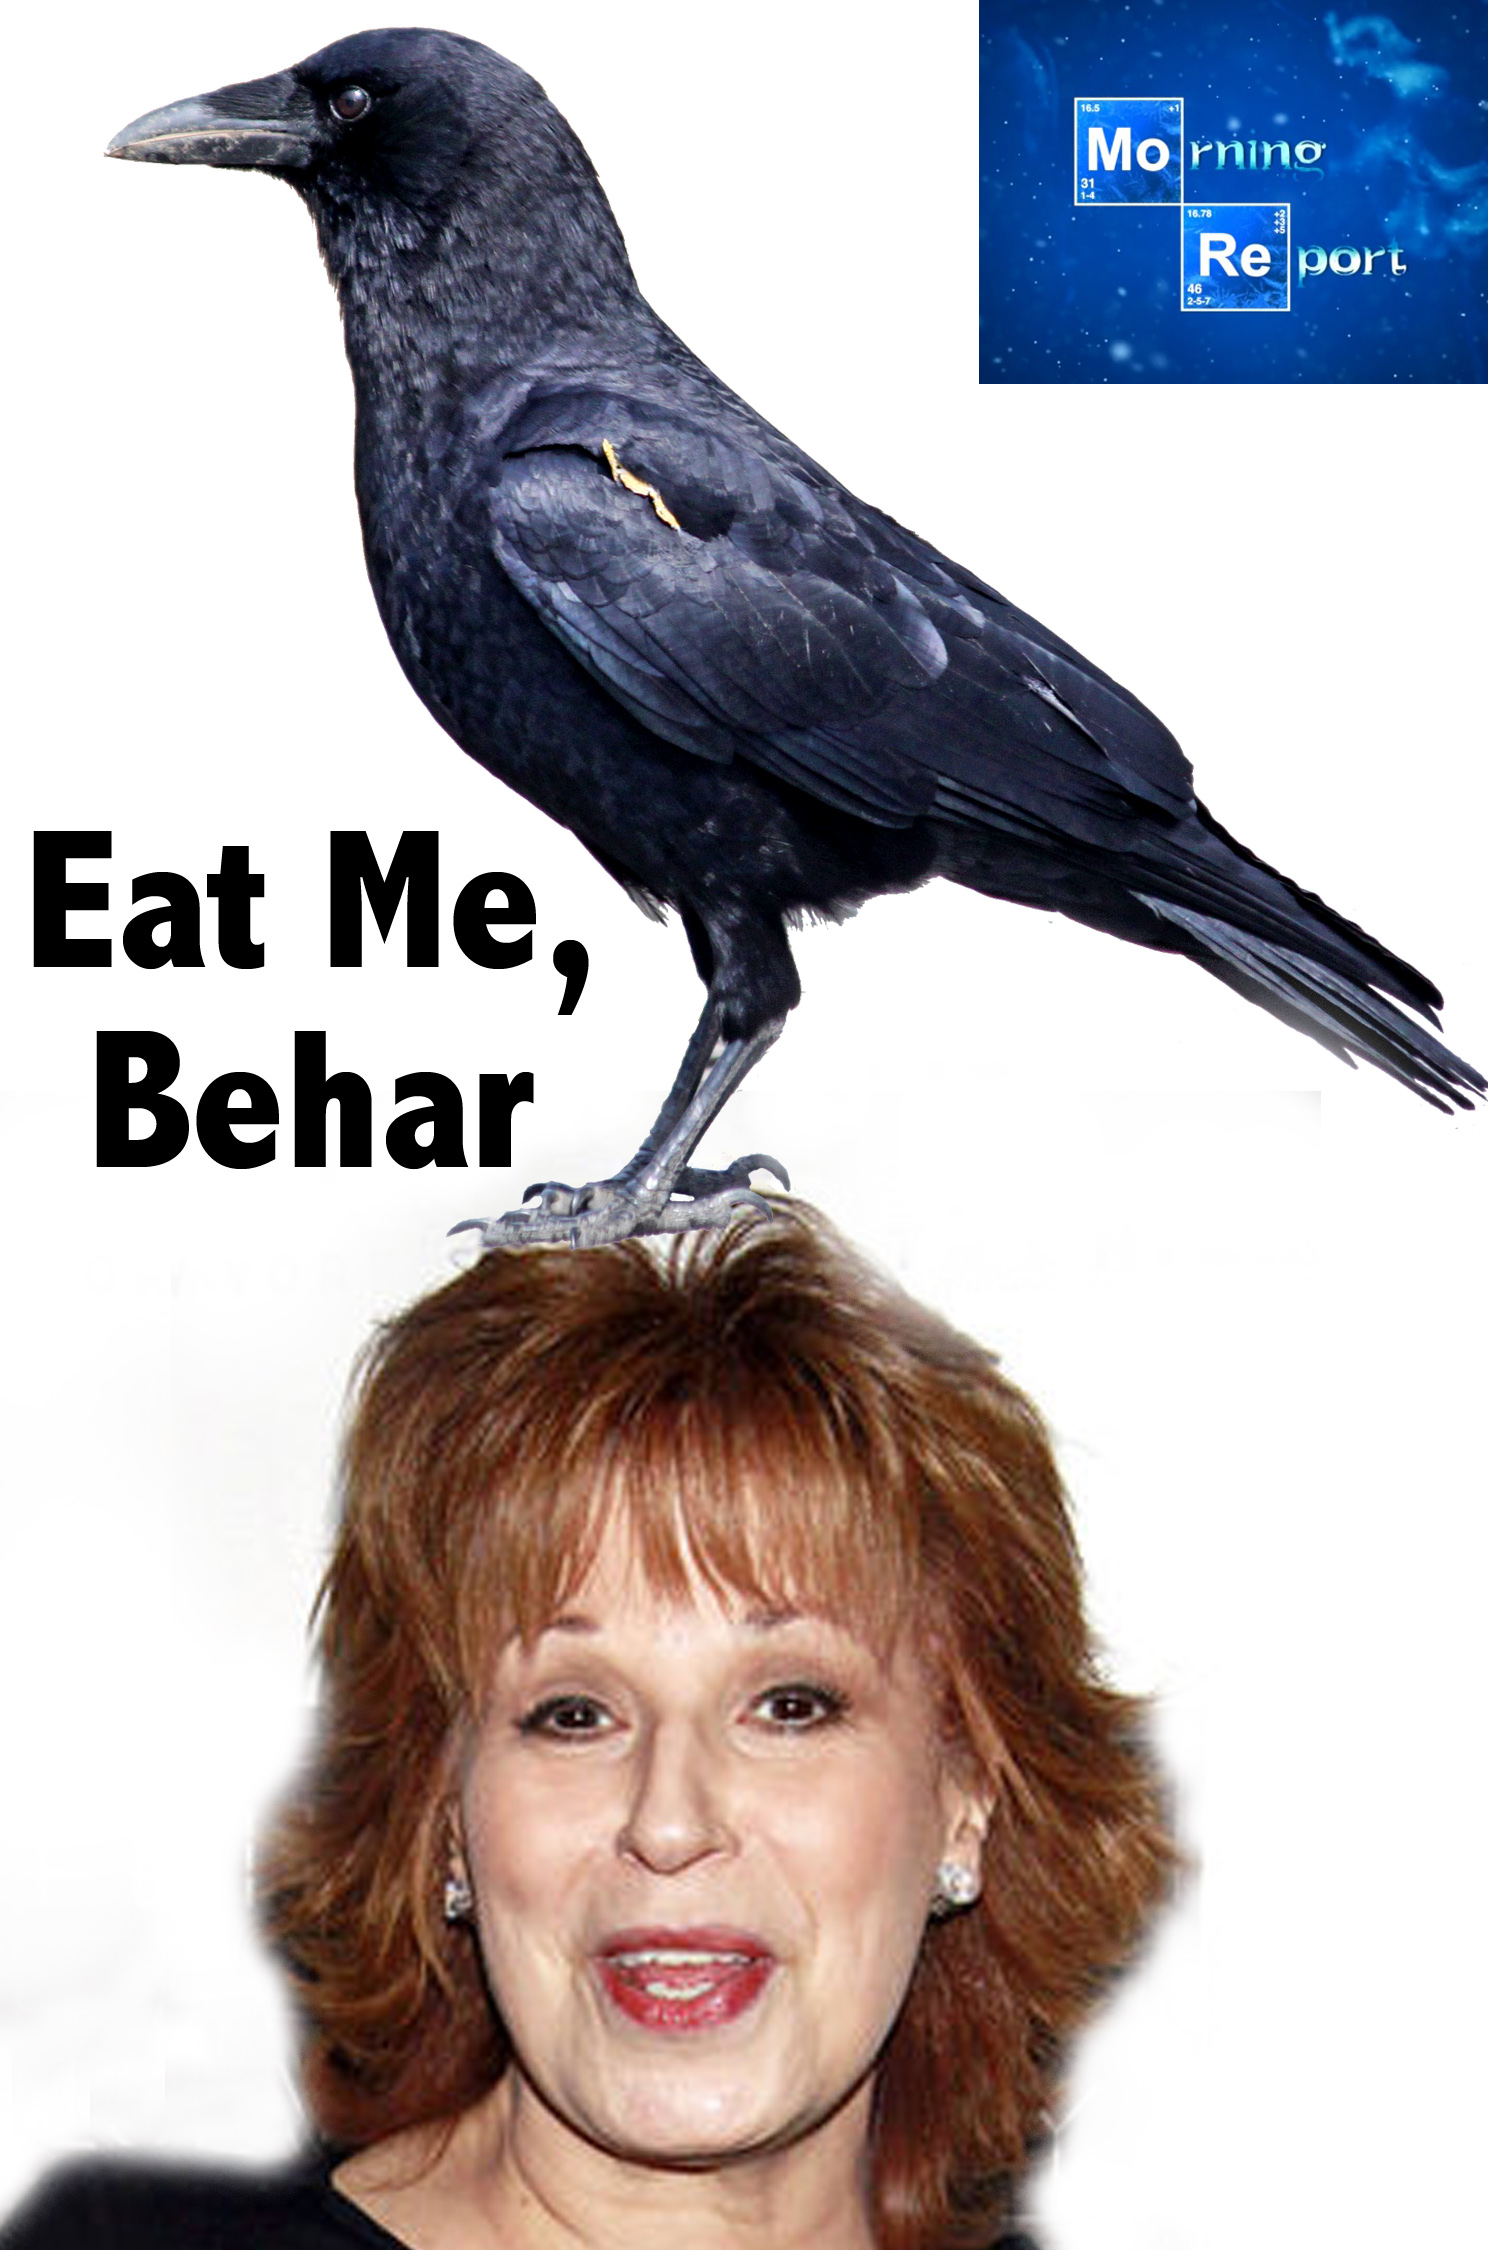 eatmebehar.jpg